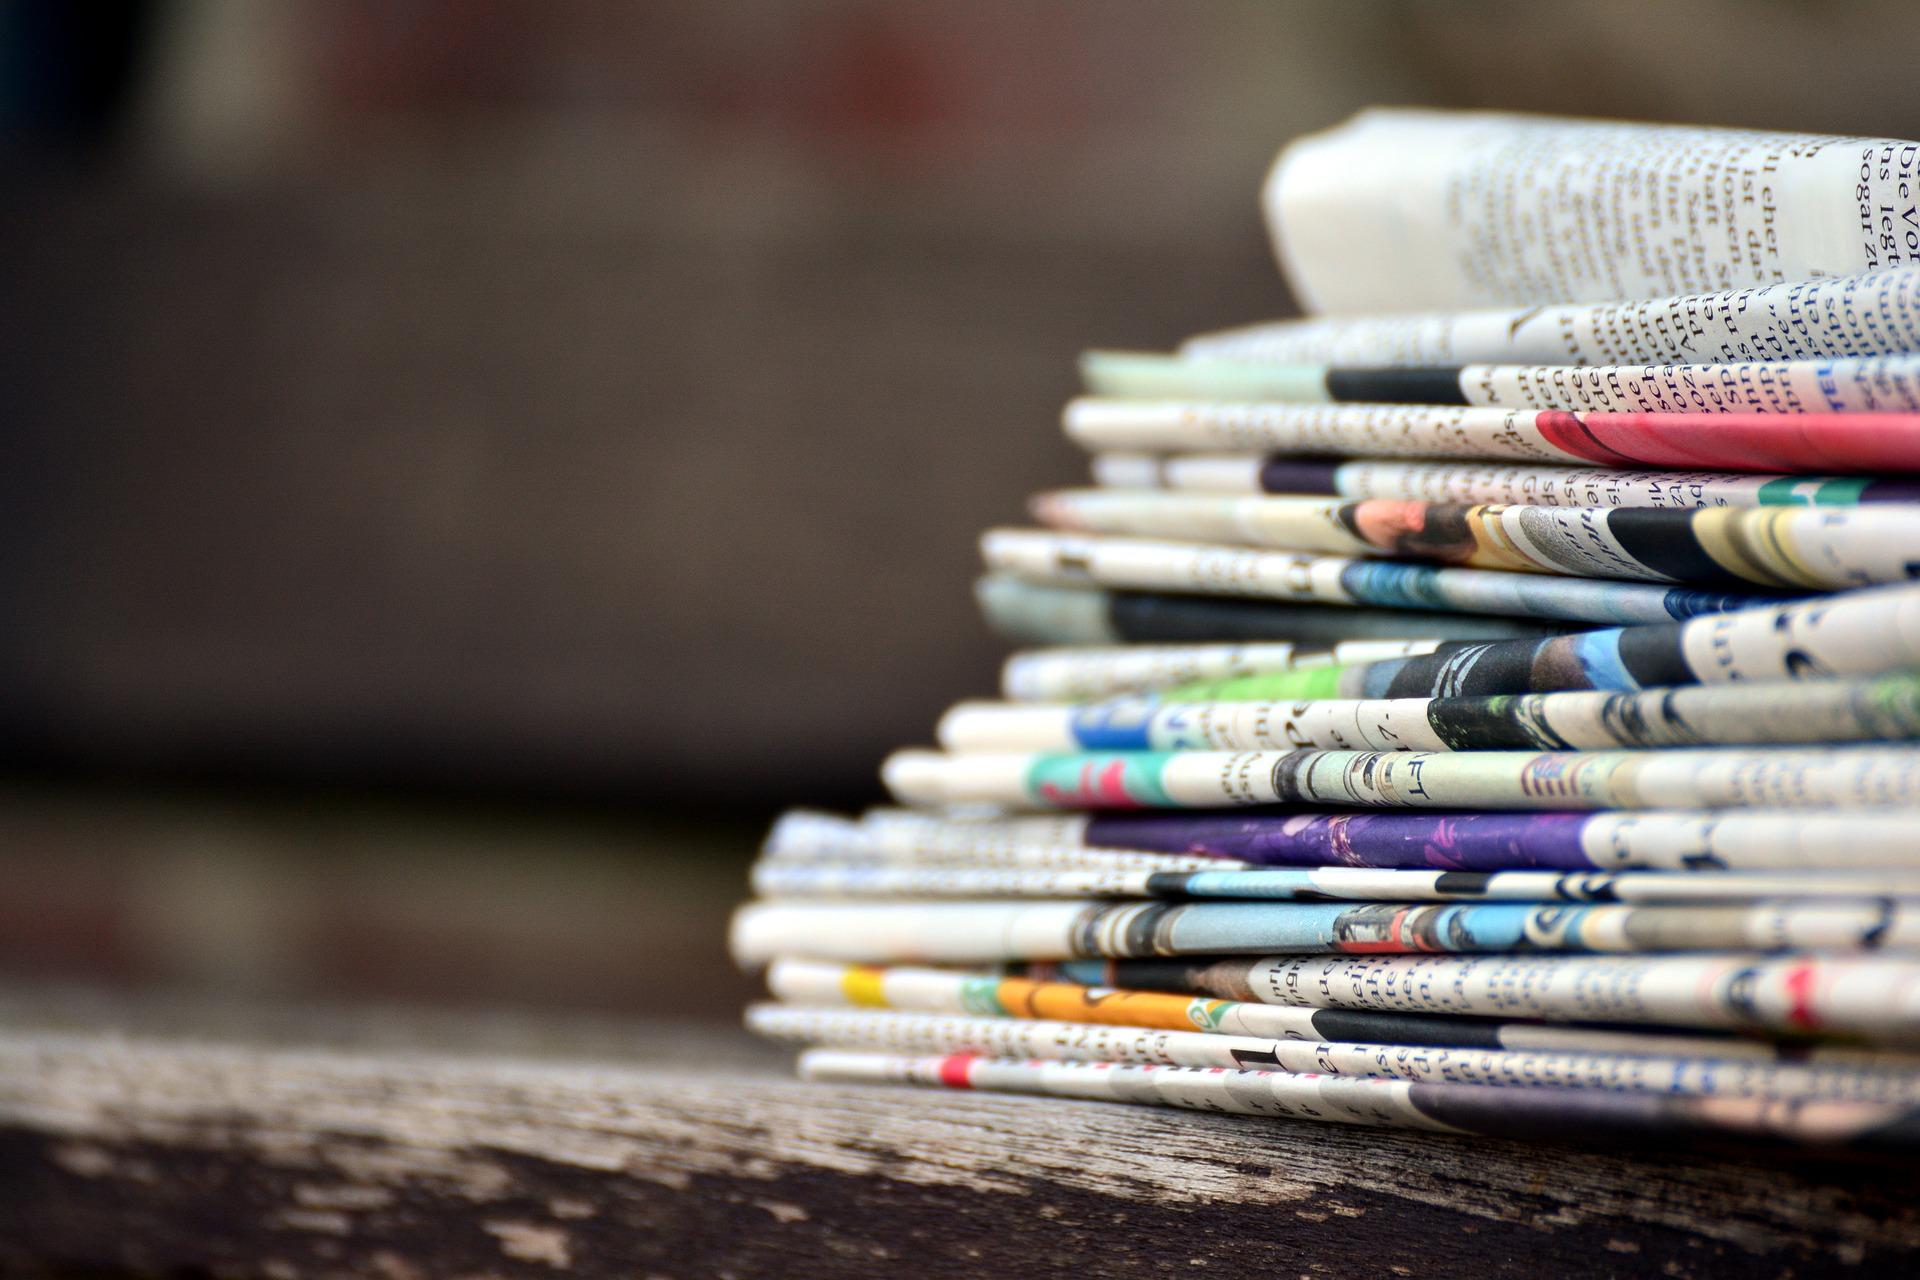 Newspapers 3488861 1920